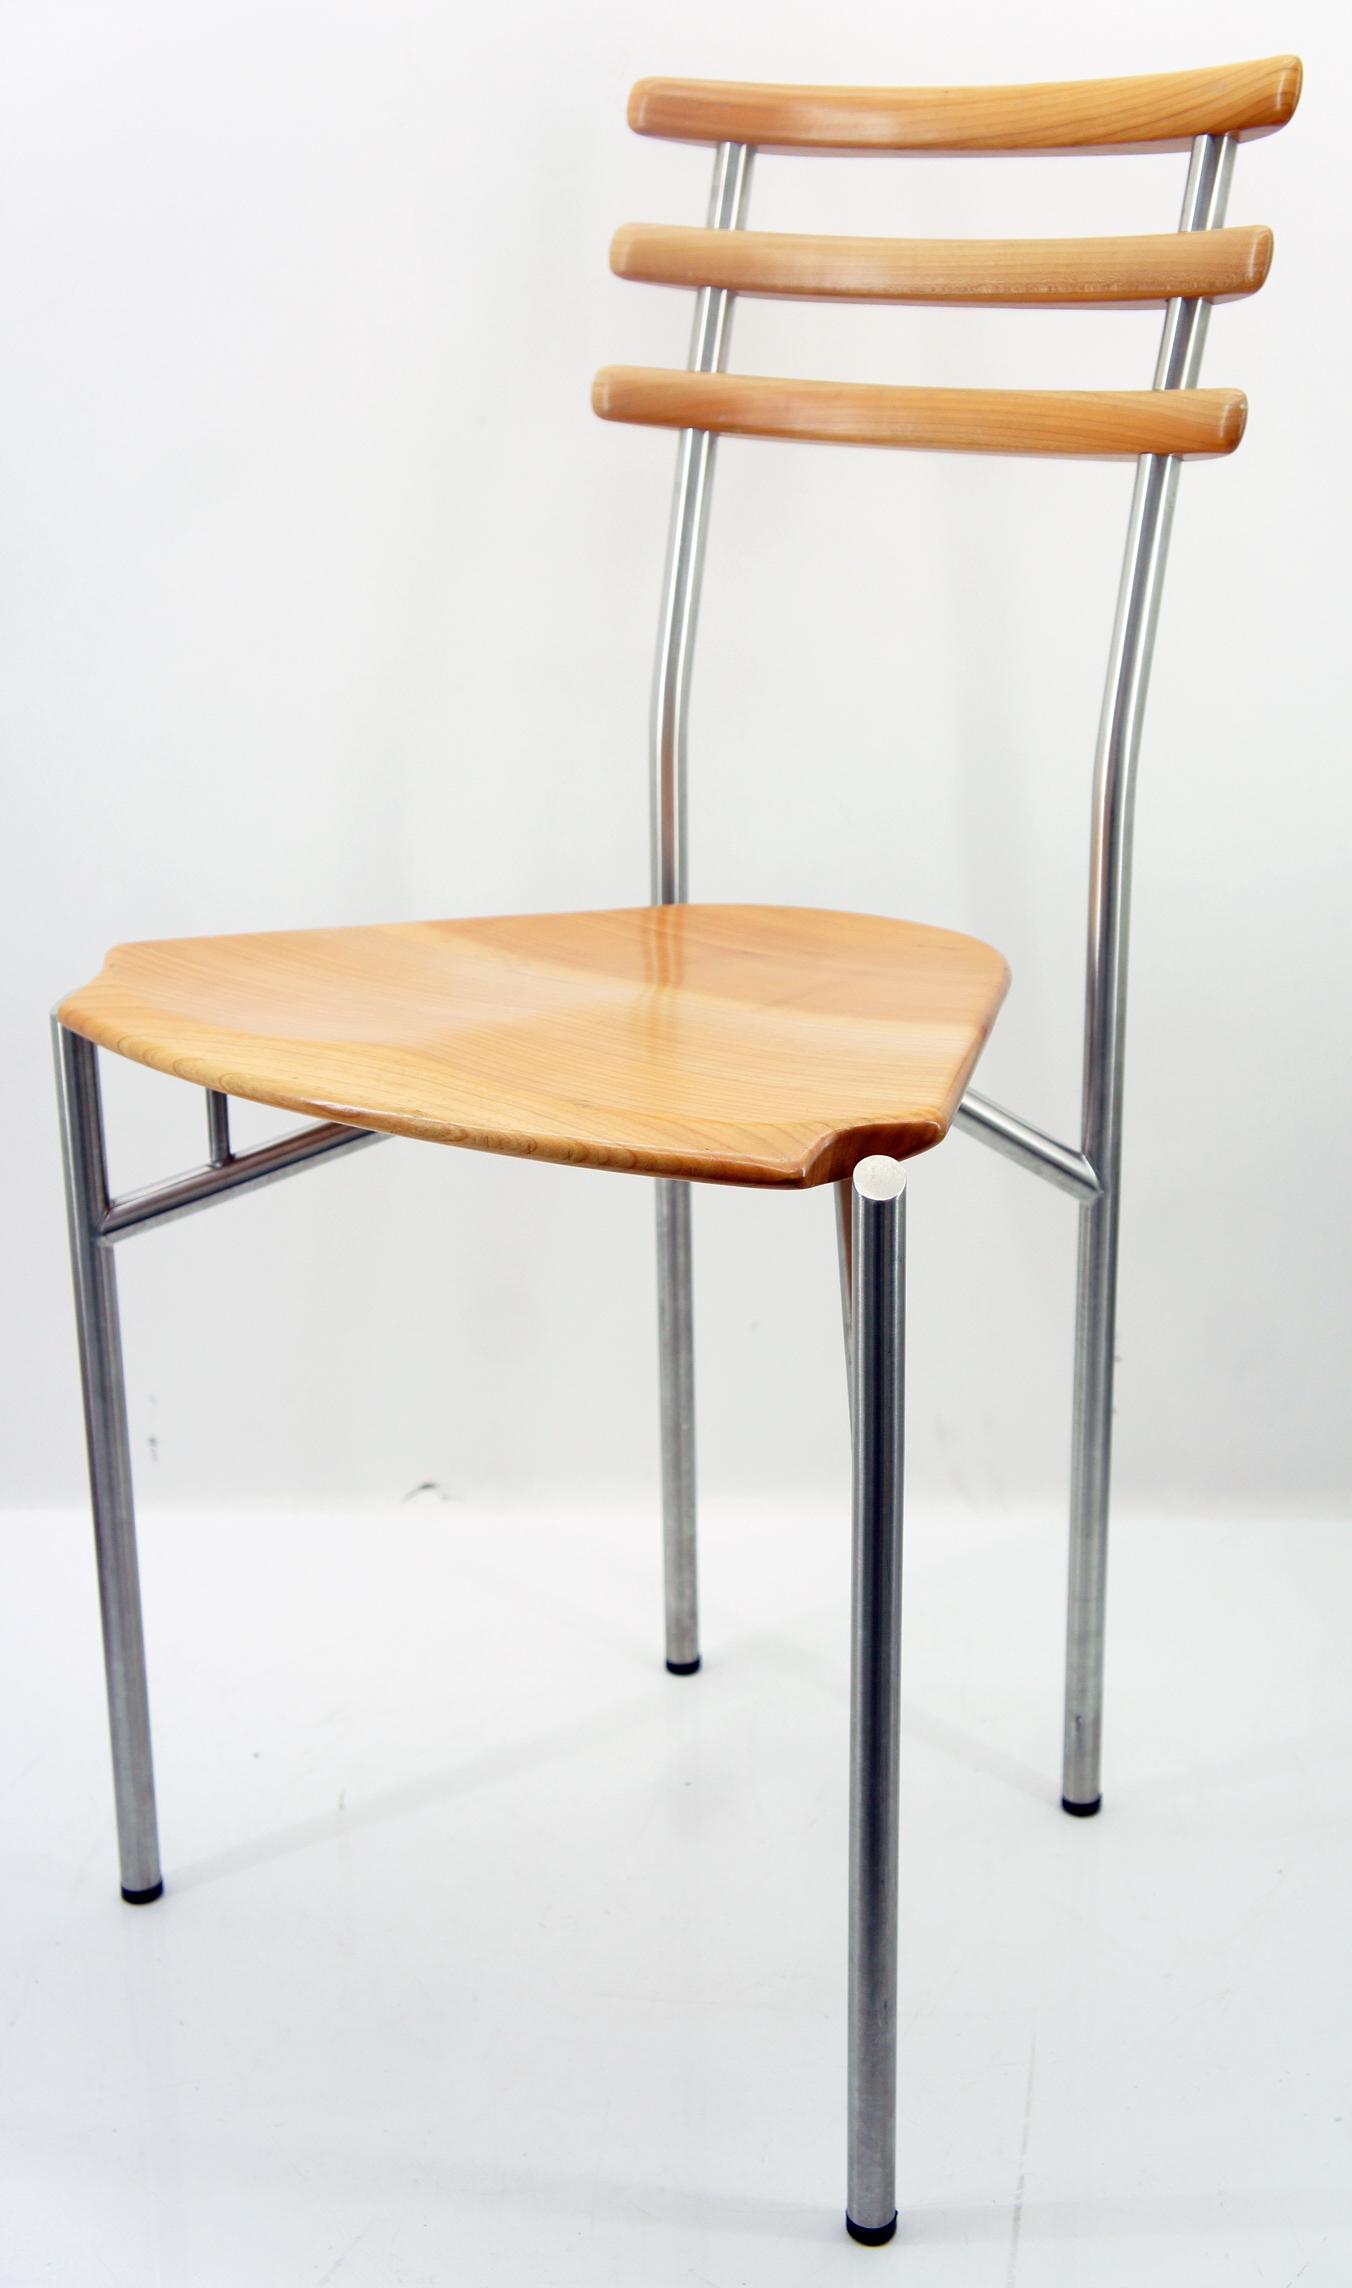 Zumsteg zwitzerland onda z15 stuhl massivholz birnbaum for Stuhl design gebraucht